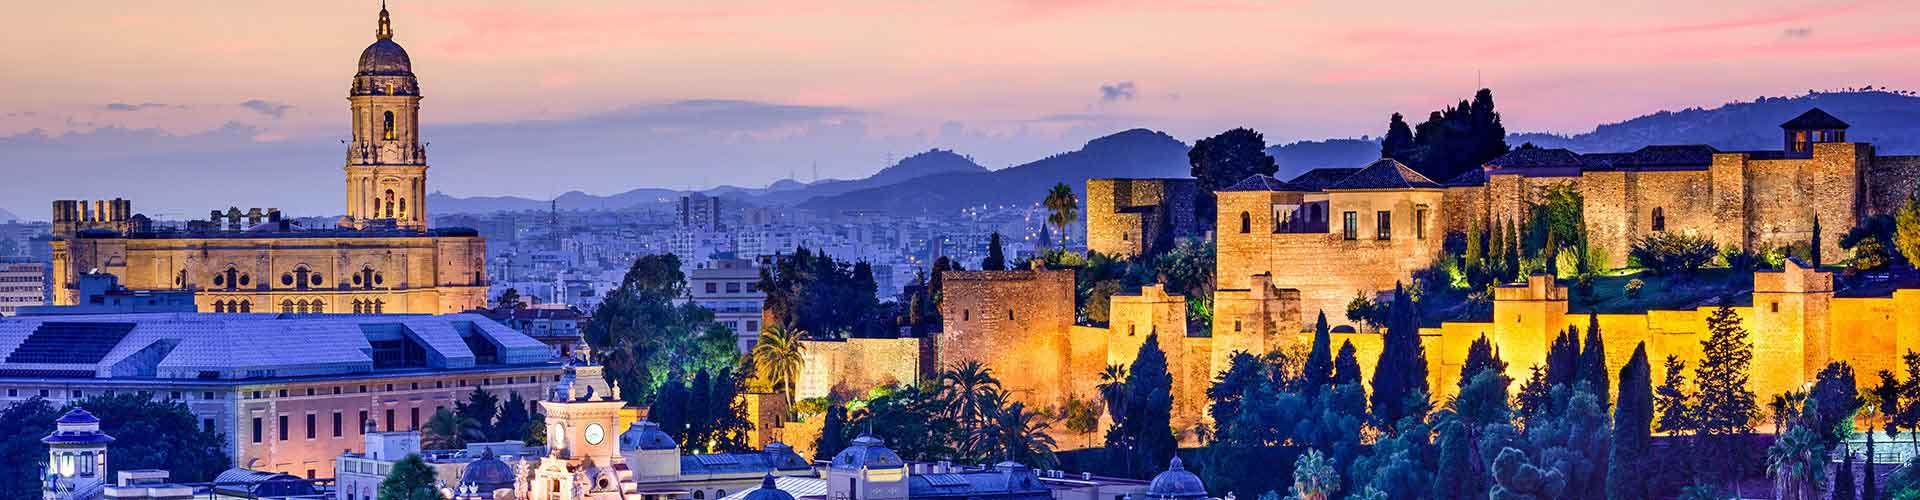 Málaga - Apartamentos en Málaga. Mapas de Málaga, Fotos y comentarios para cada Apartamento en Málaga.